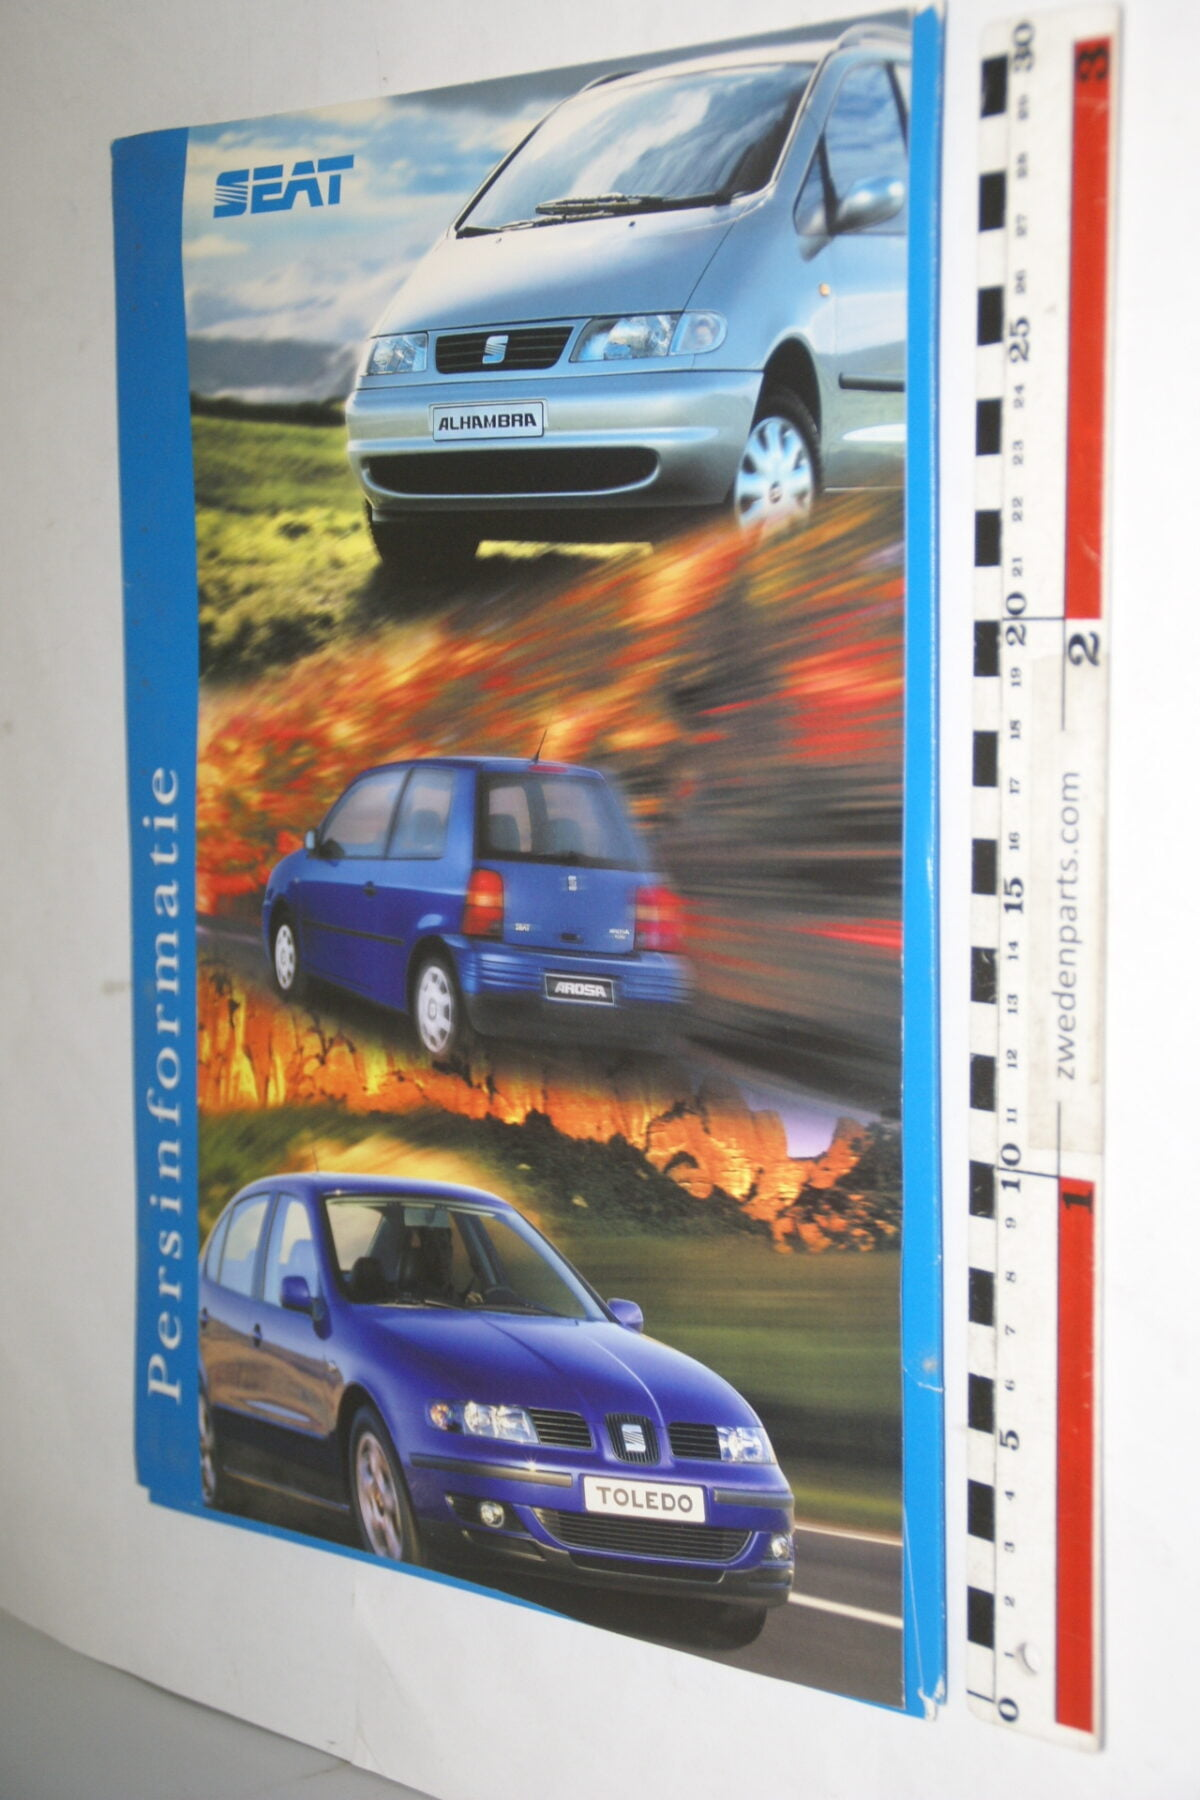 DSC03751 1999 originele persmap dikke ringband SEAT, AutoRAI-edf496e5